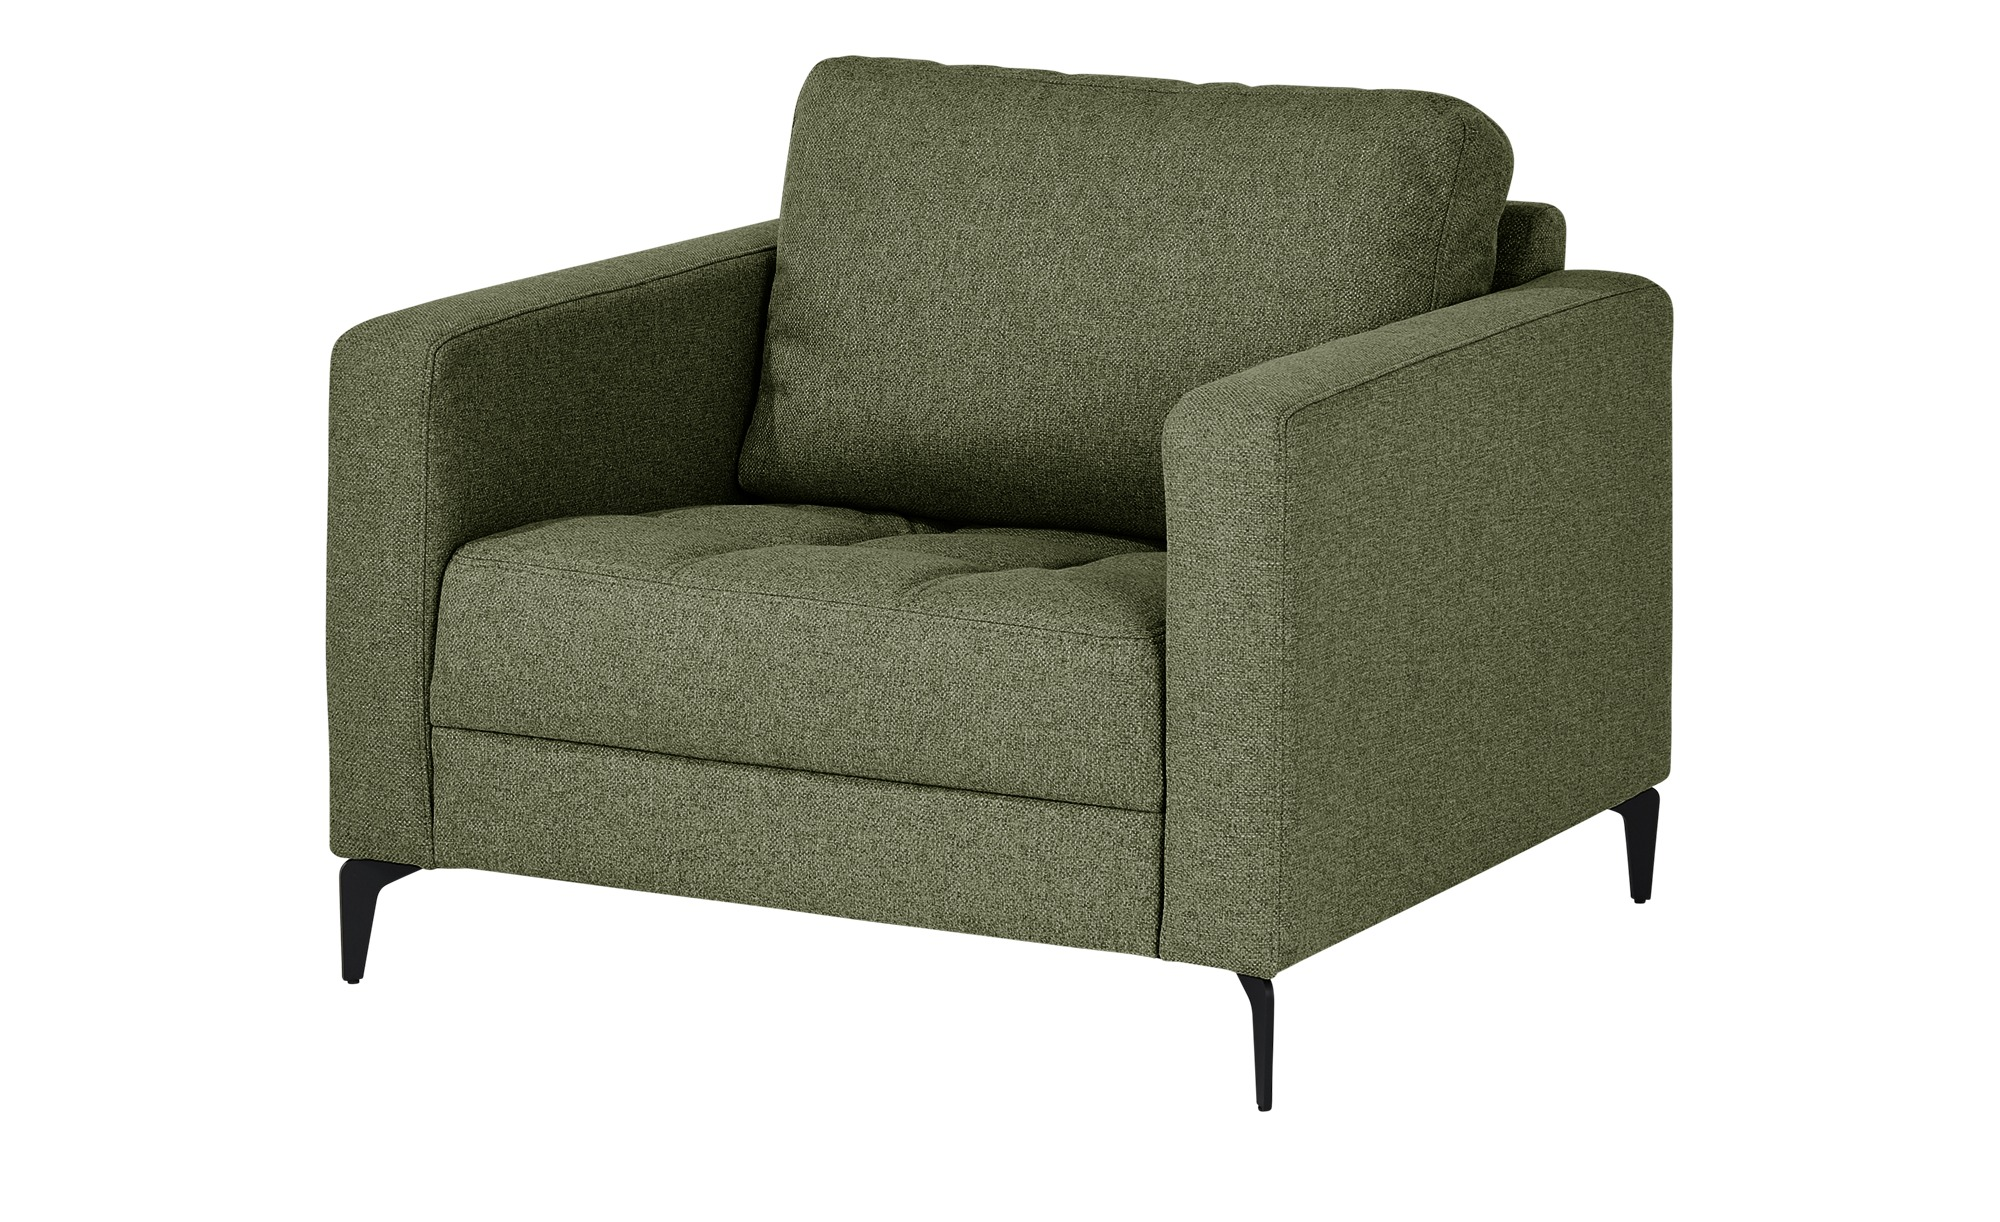 smart Sessel  Gesa ¦ grün ¦ Maße (cm): B: 102 H: 83 T: 91 Polstermöbel > Sessel > Polstersessel - Höffner